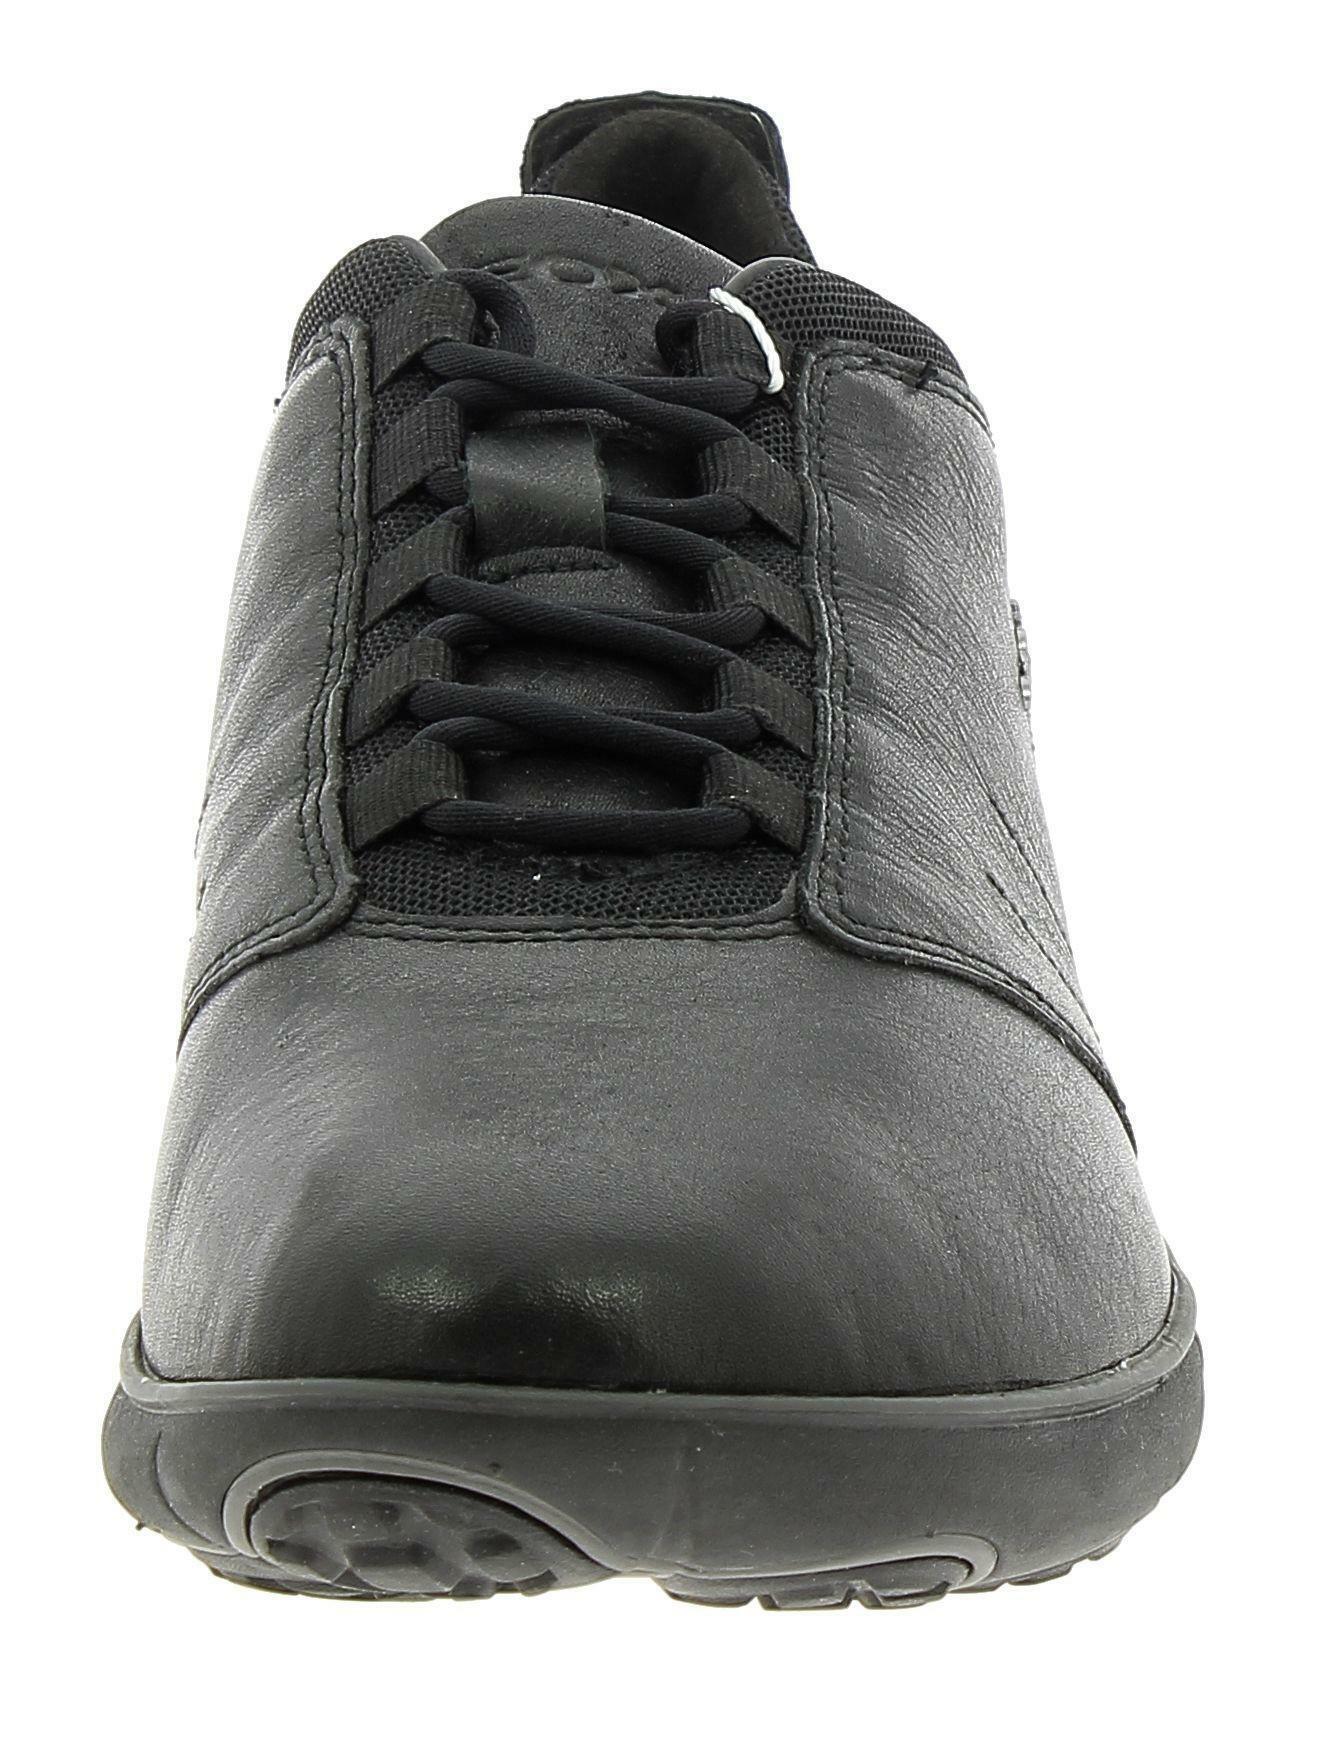 competitive price 9c011 a7a5e Geox u nebula a scarpe sportive uomo nere